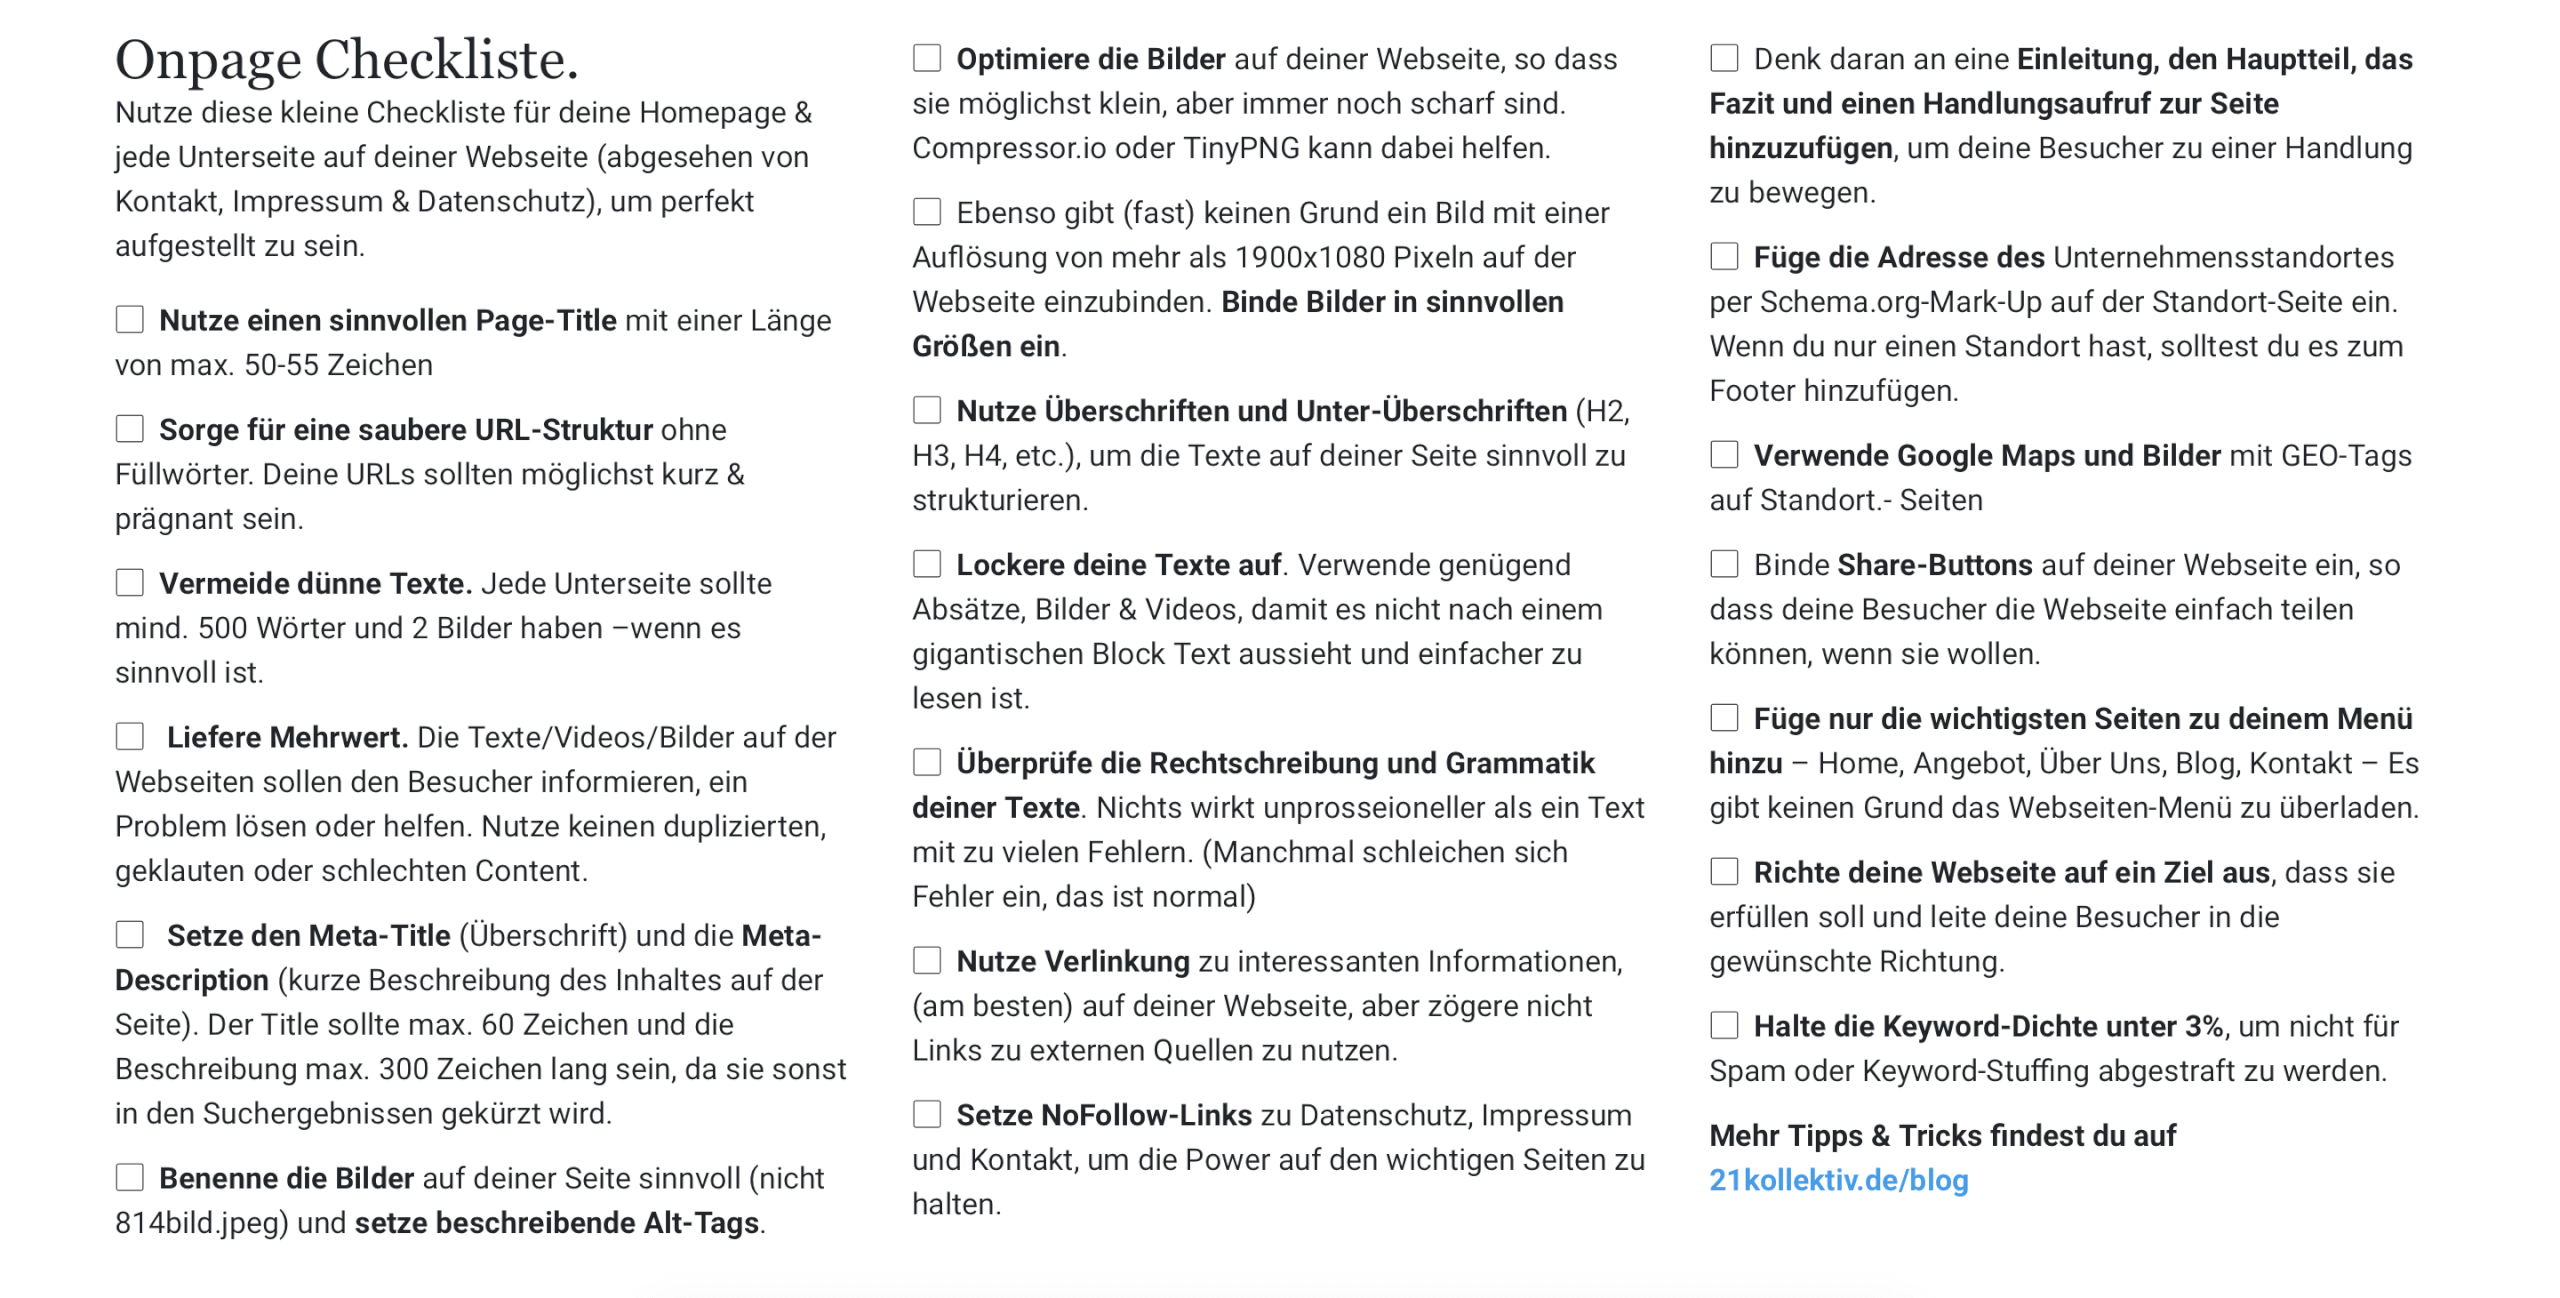 OnPage Checkliste